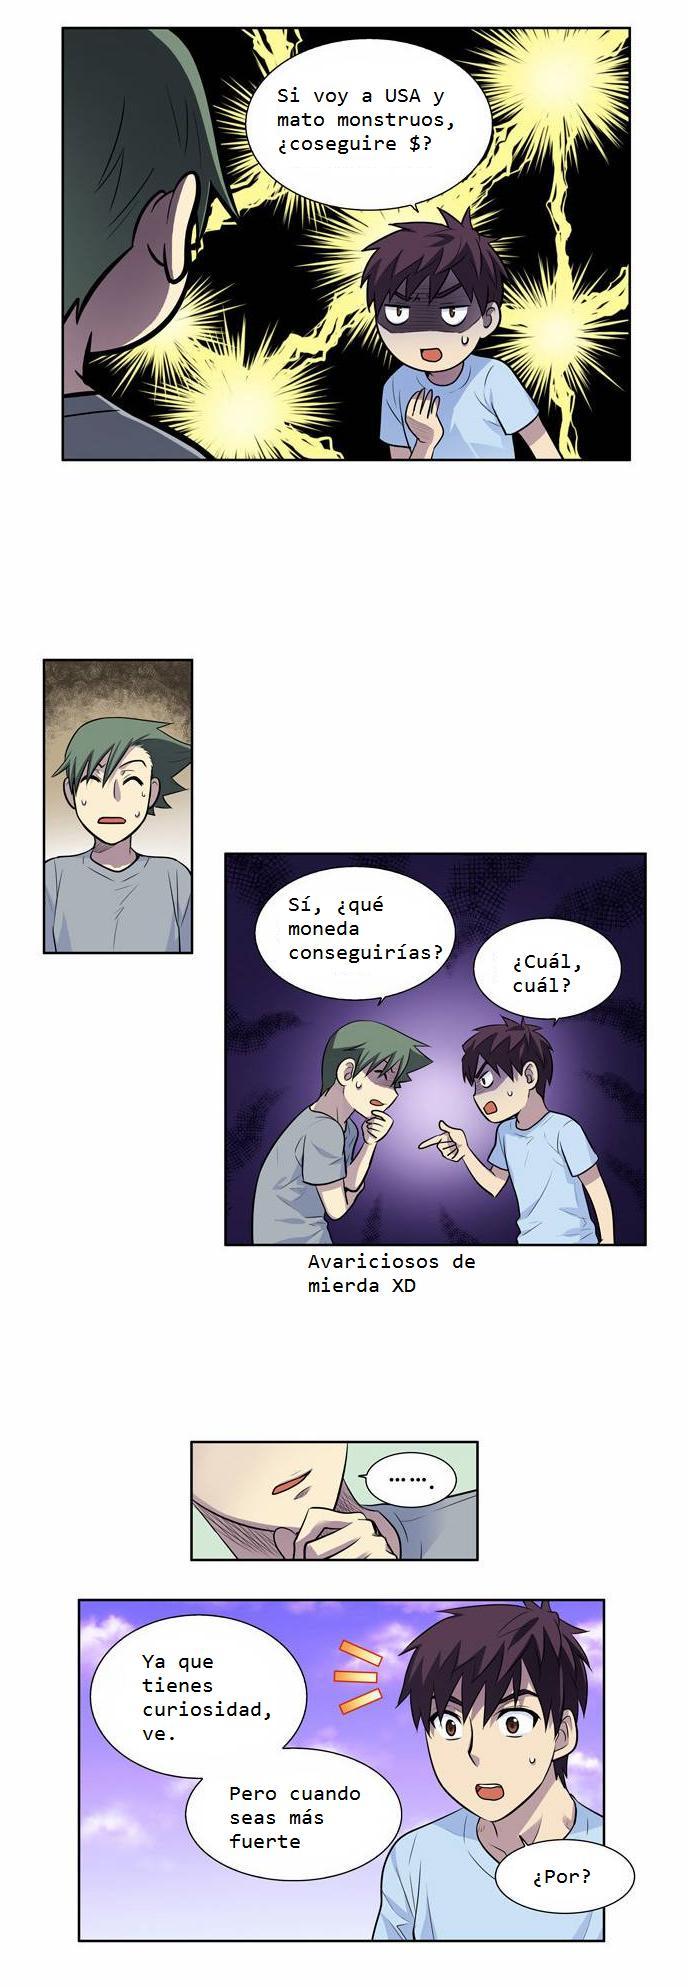 http://c5.ninemanga.com/es_manga/61/1725/396913/4d55de0511aaa18ae946d7527cdebbac.jpg Page 6